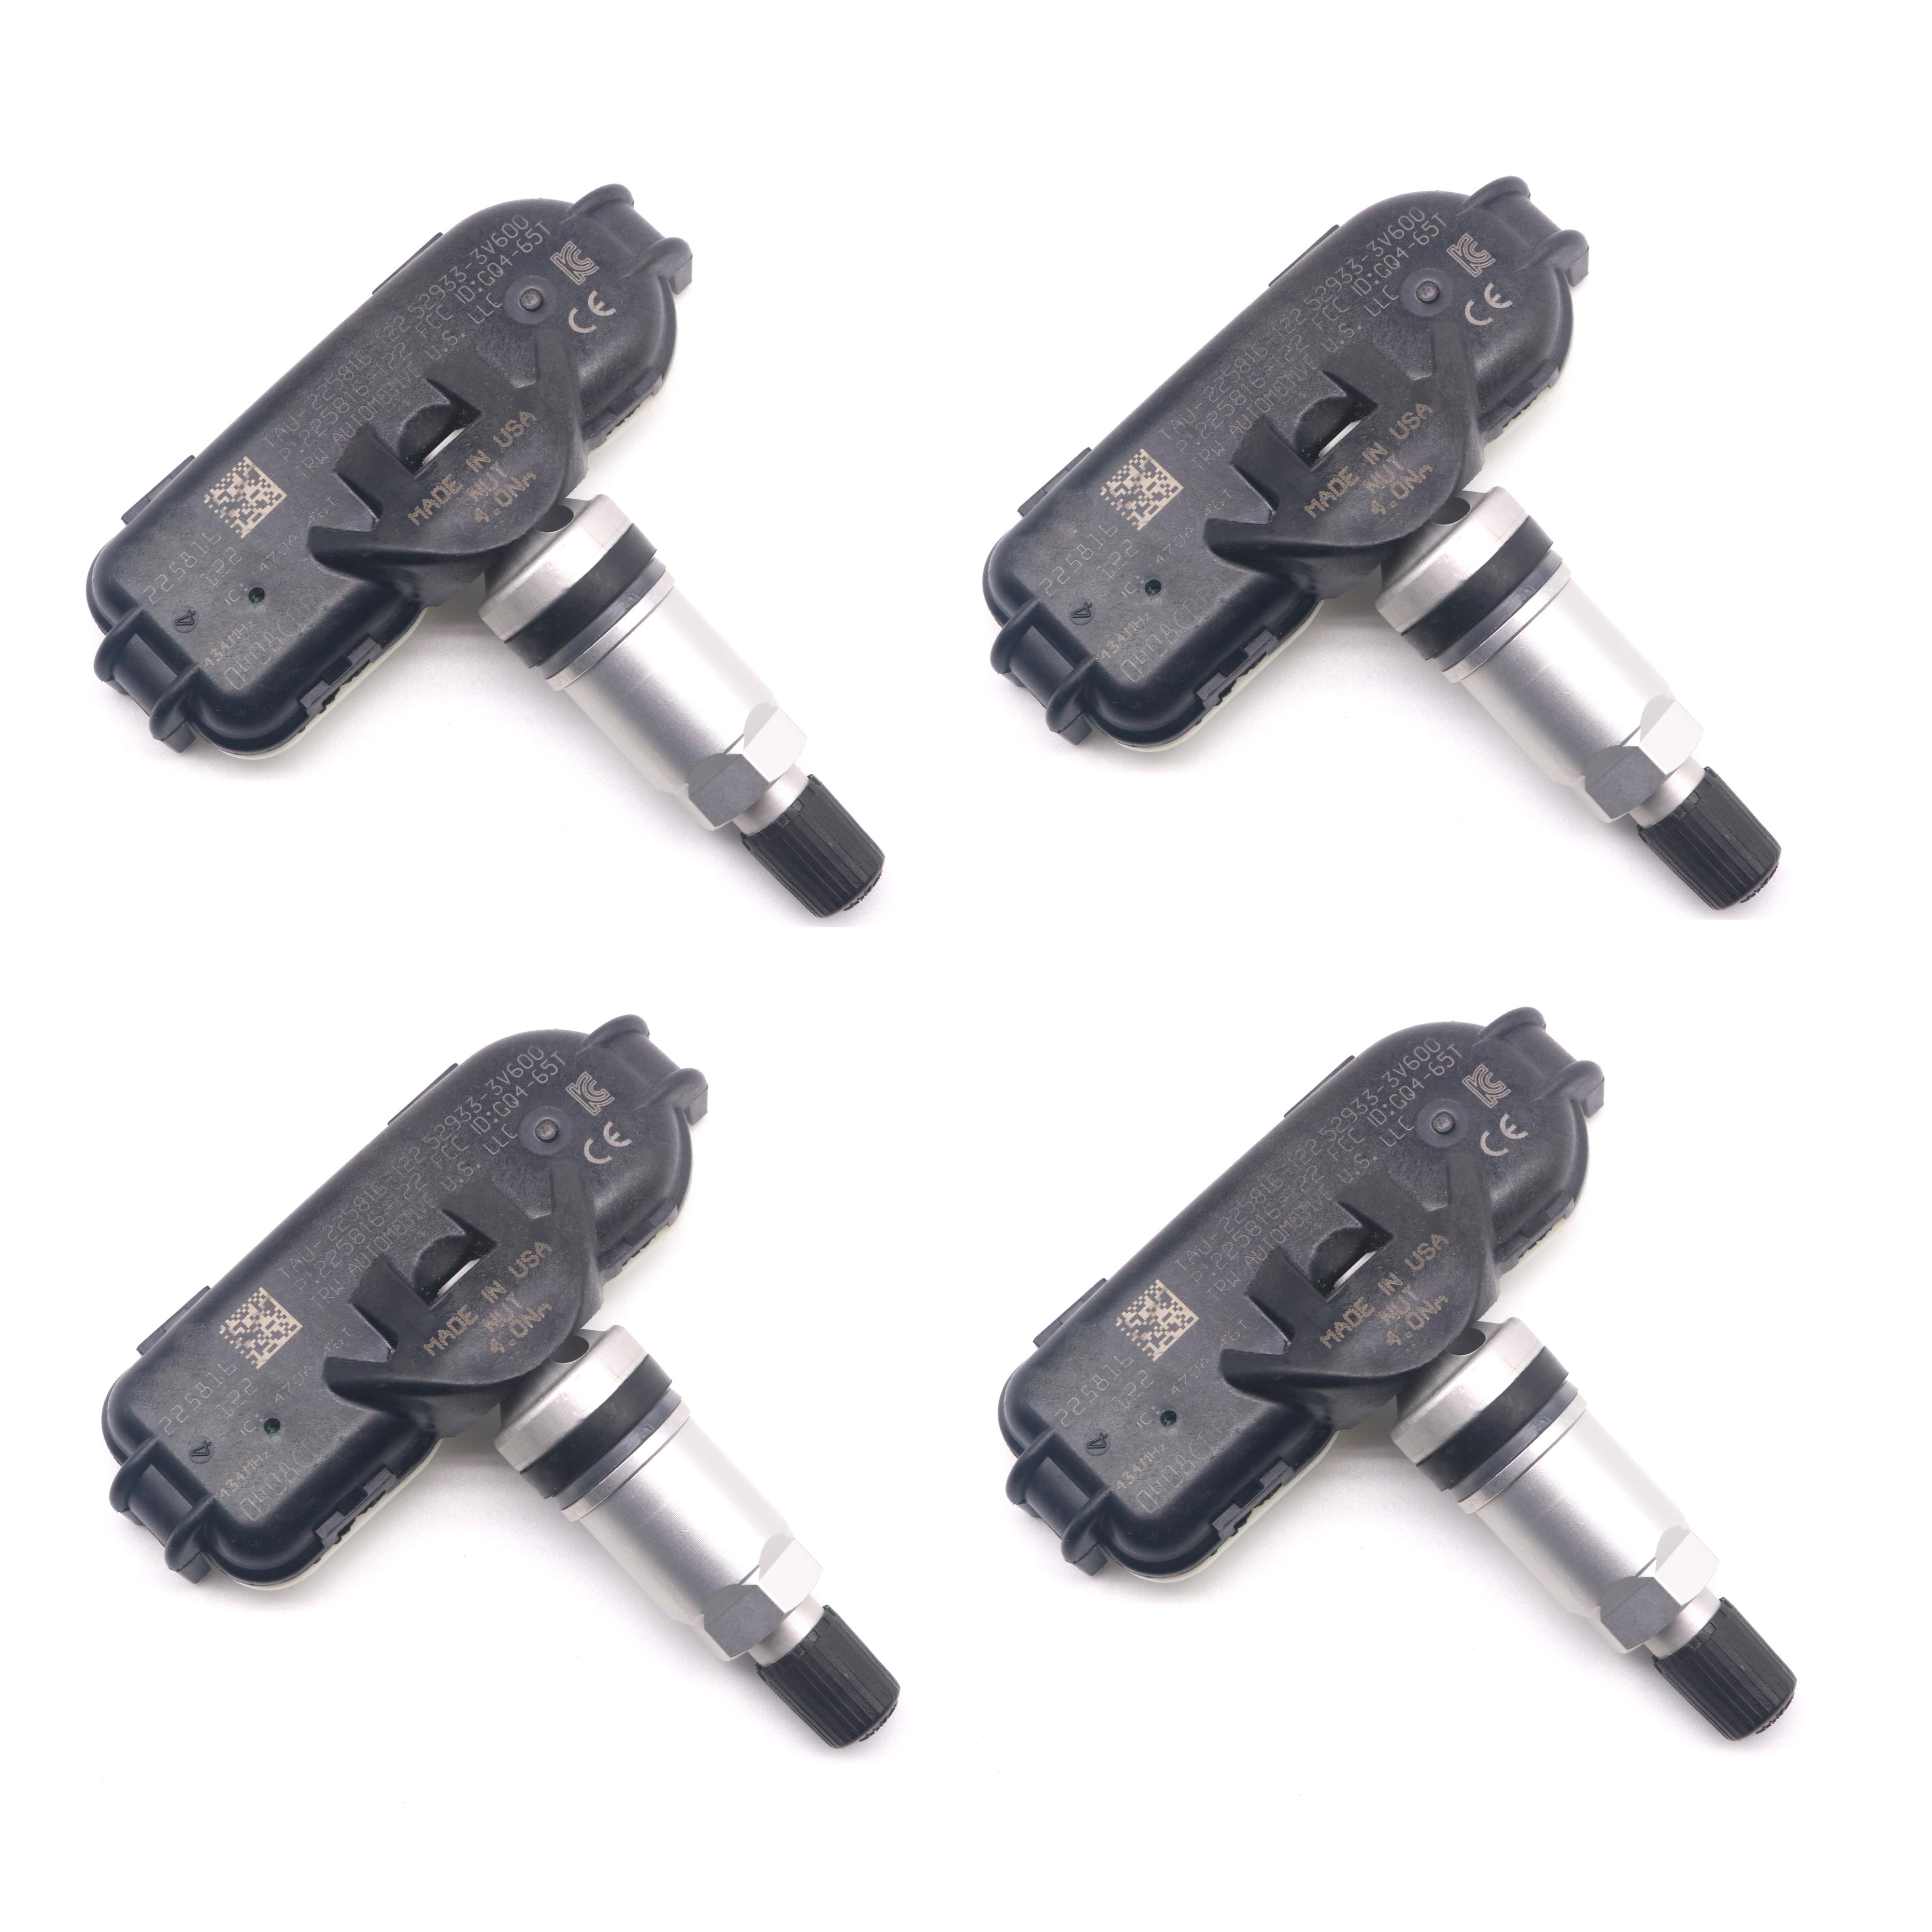 1 OE Replacement Tyre Pressure Valve for Hyundai i40 2011-2014 TPMS Sensor